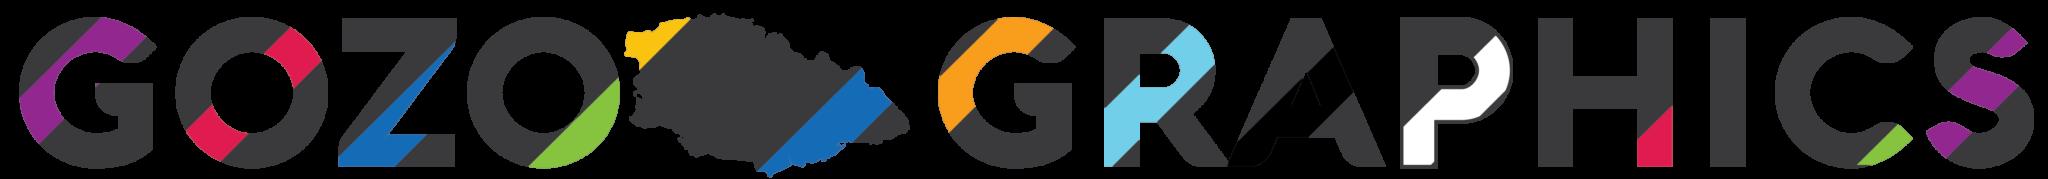 Gozo Graphics Malta Logo